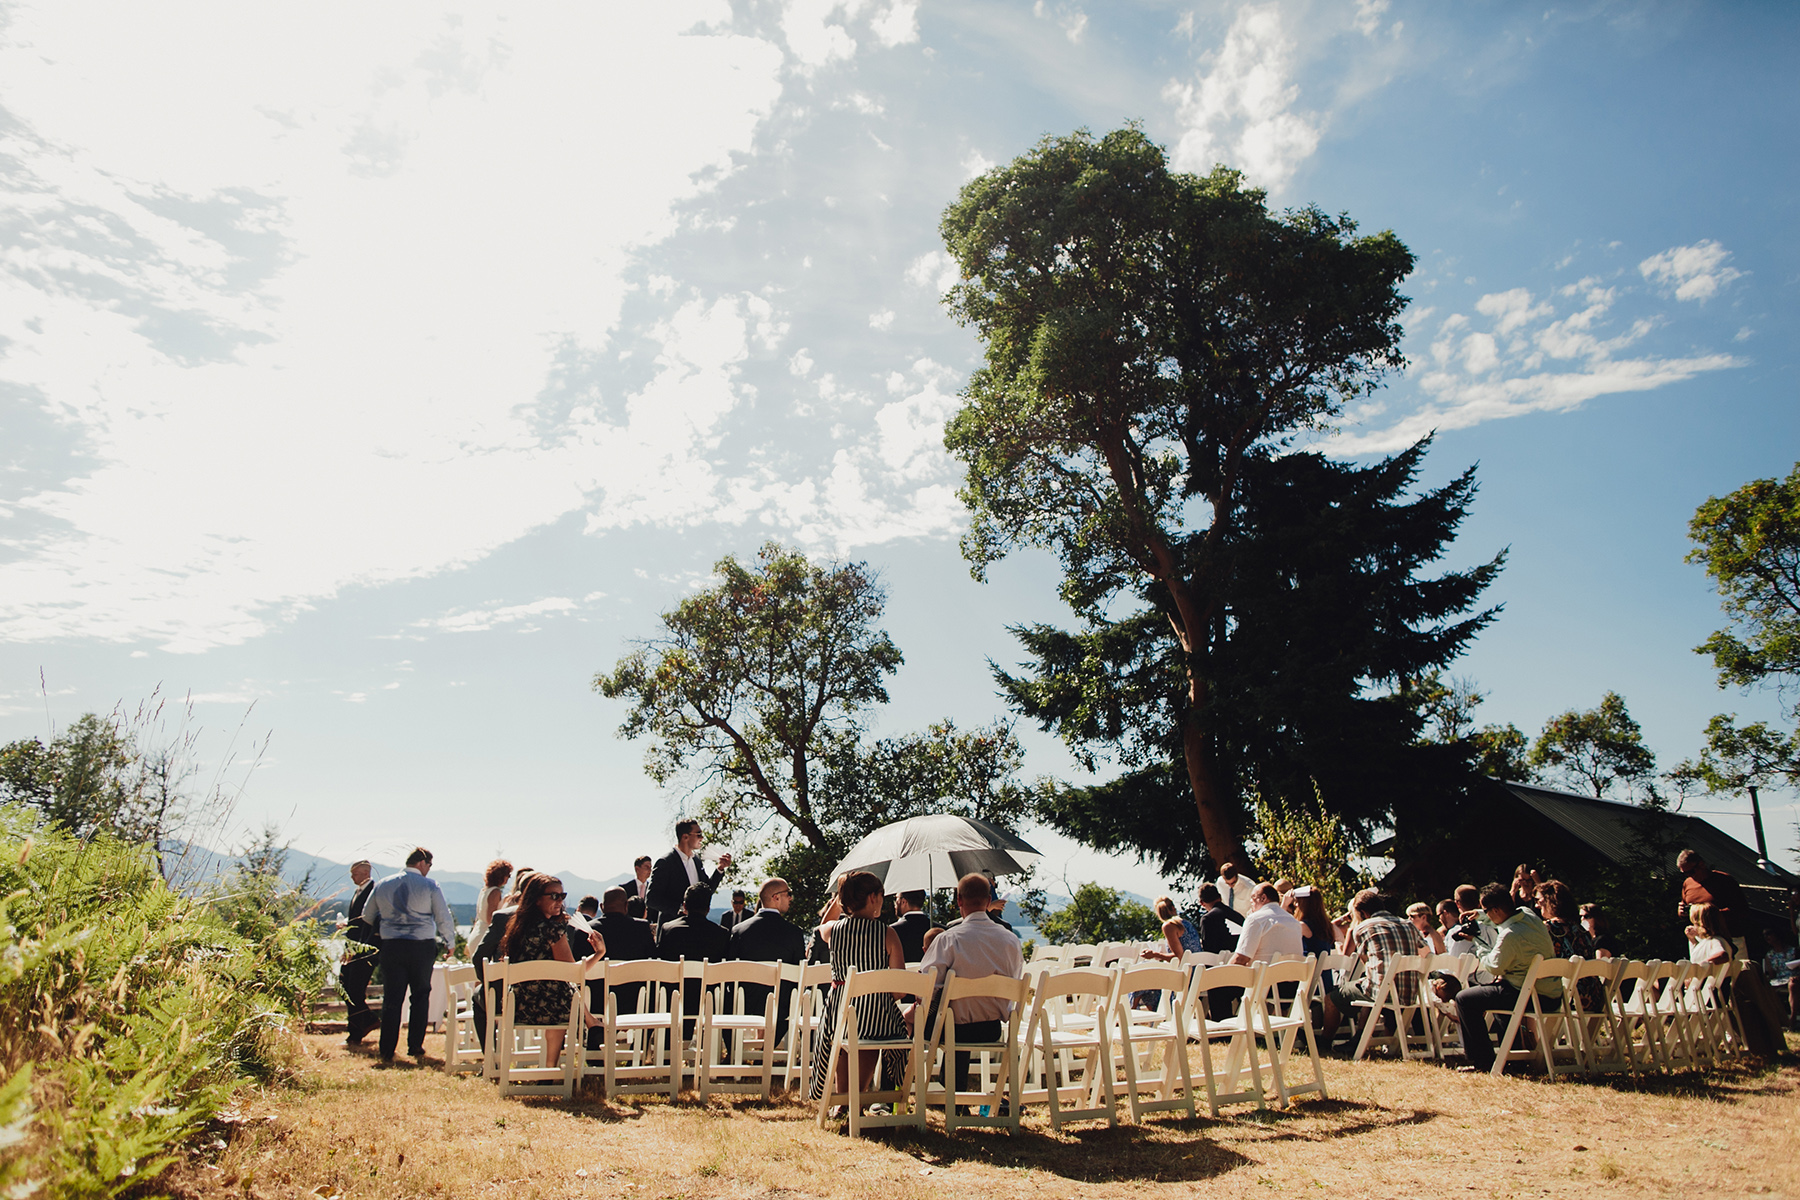 bodega-ridge-wedding-photos-0058.jpg